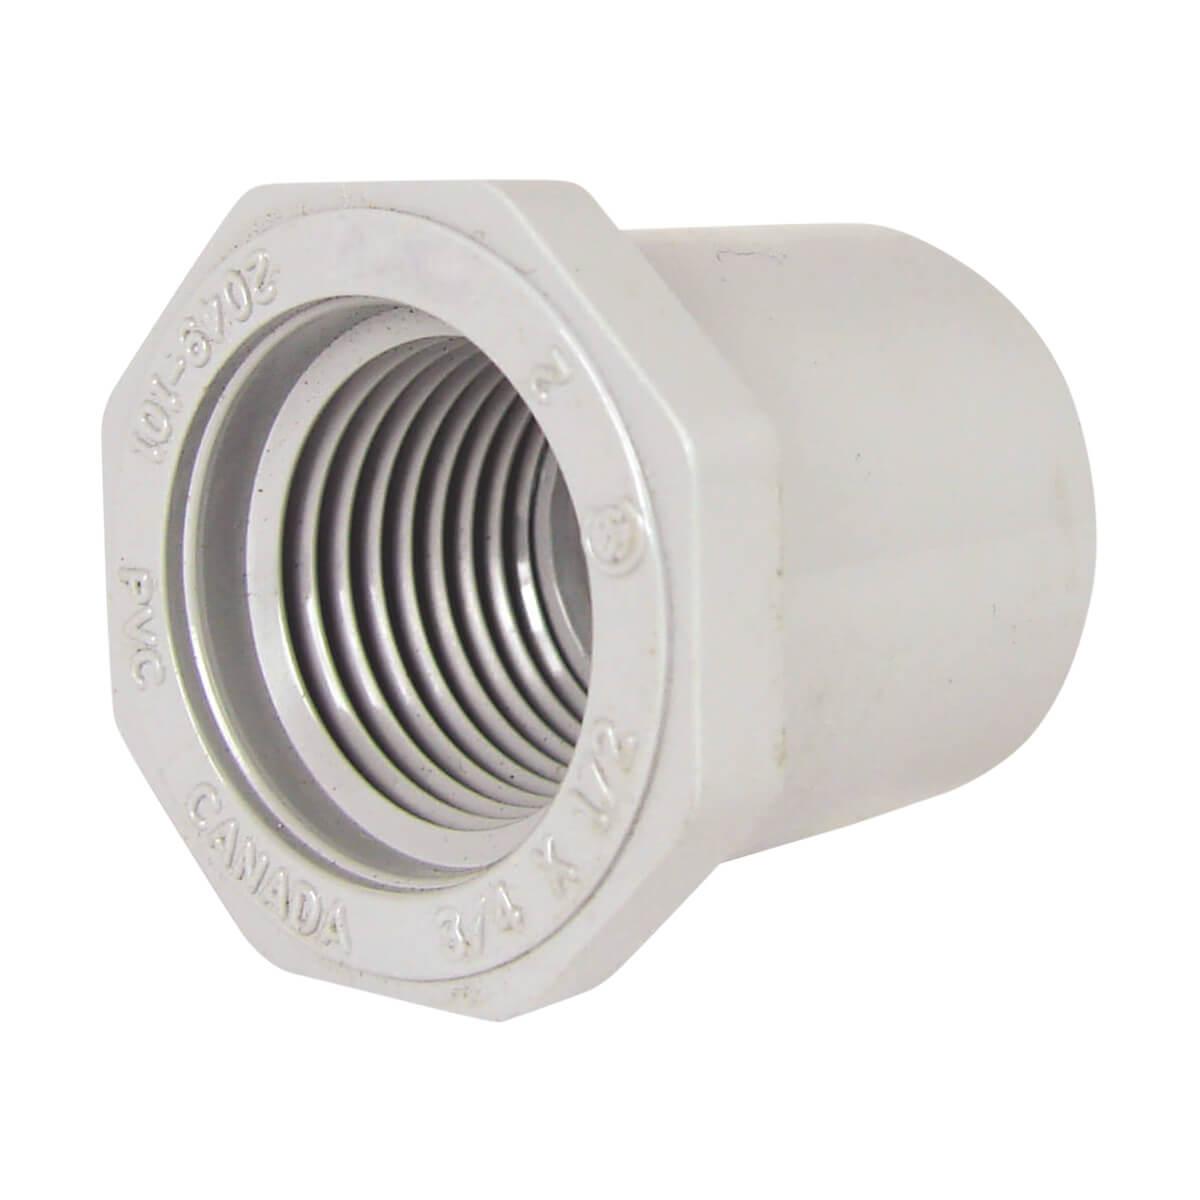 "PVC Conduit Threaded Reducer Bushing - Spigot x FPT - 3/4"" x 1/2"""